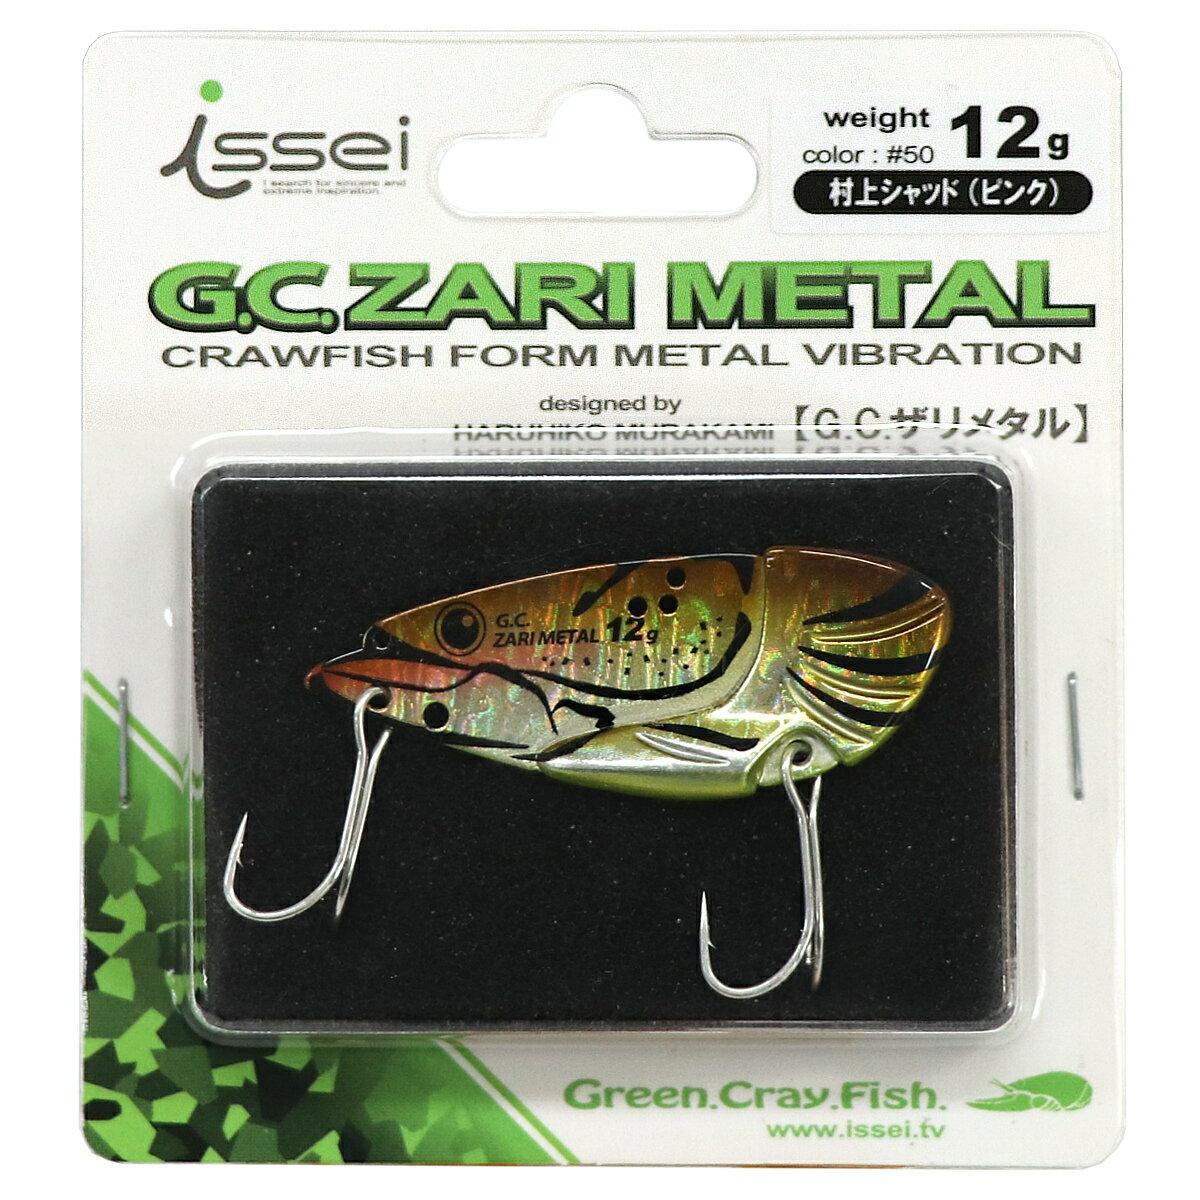 G.C.ZARI METAL 12g #50 ムラカミシャッド(ピンク)【ゆうパケット】